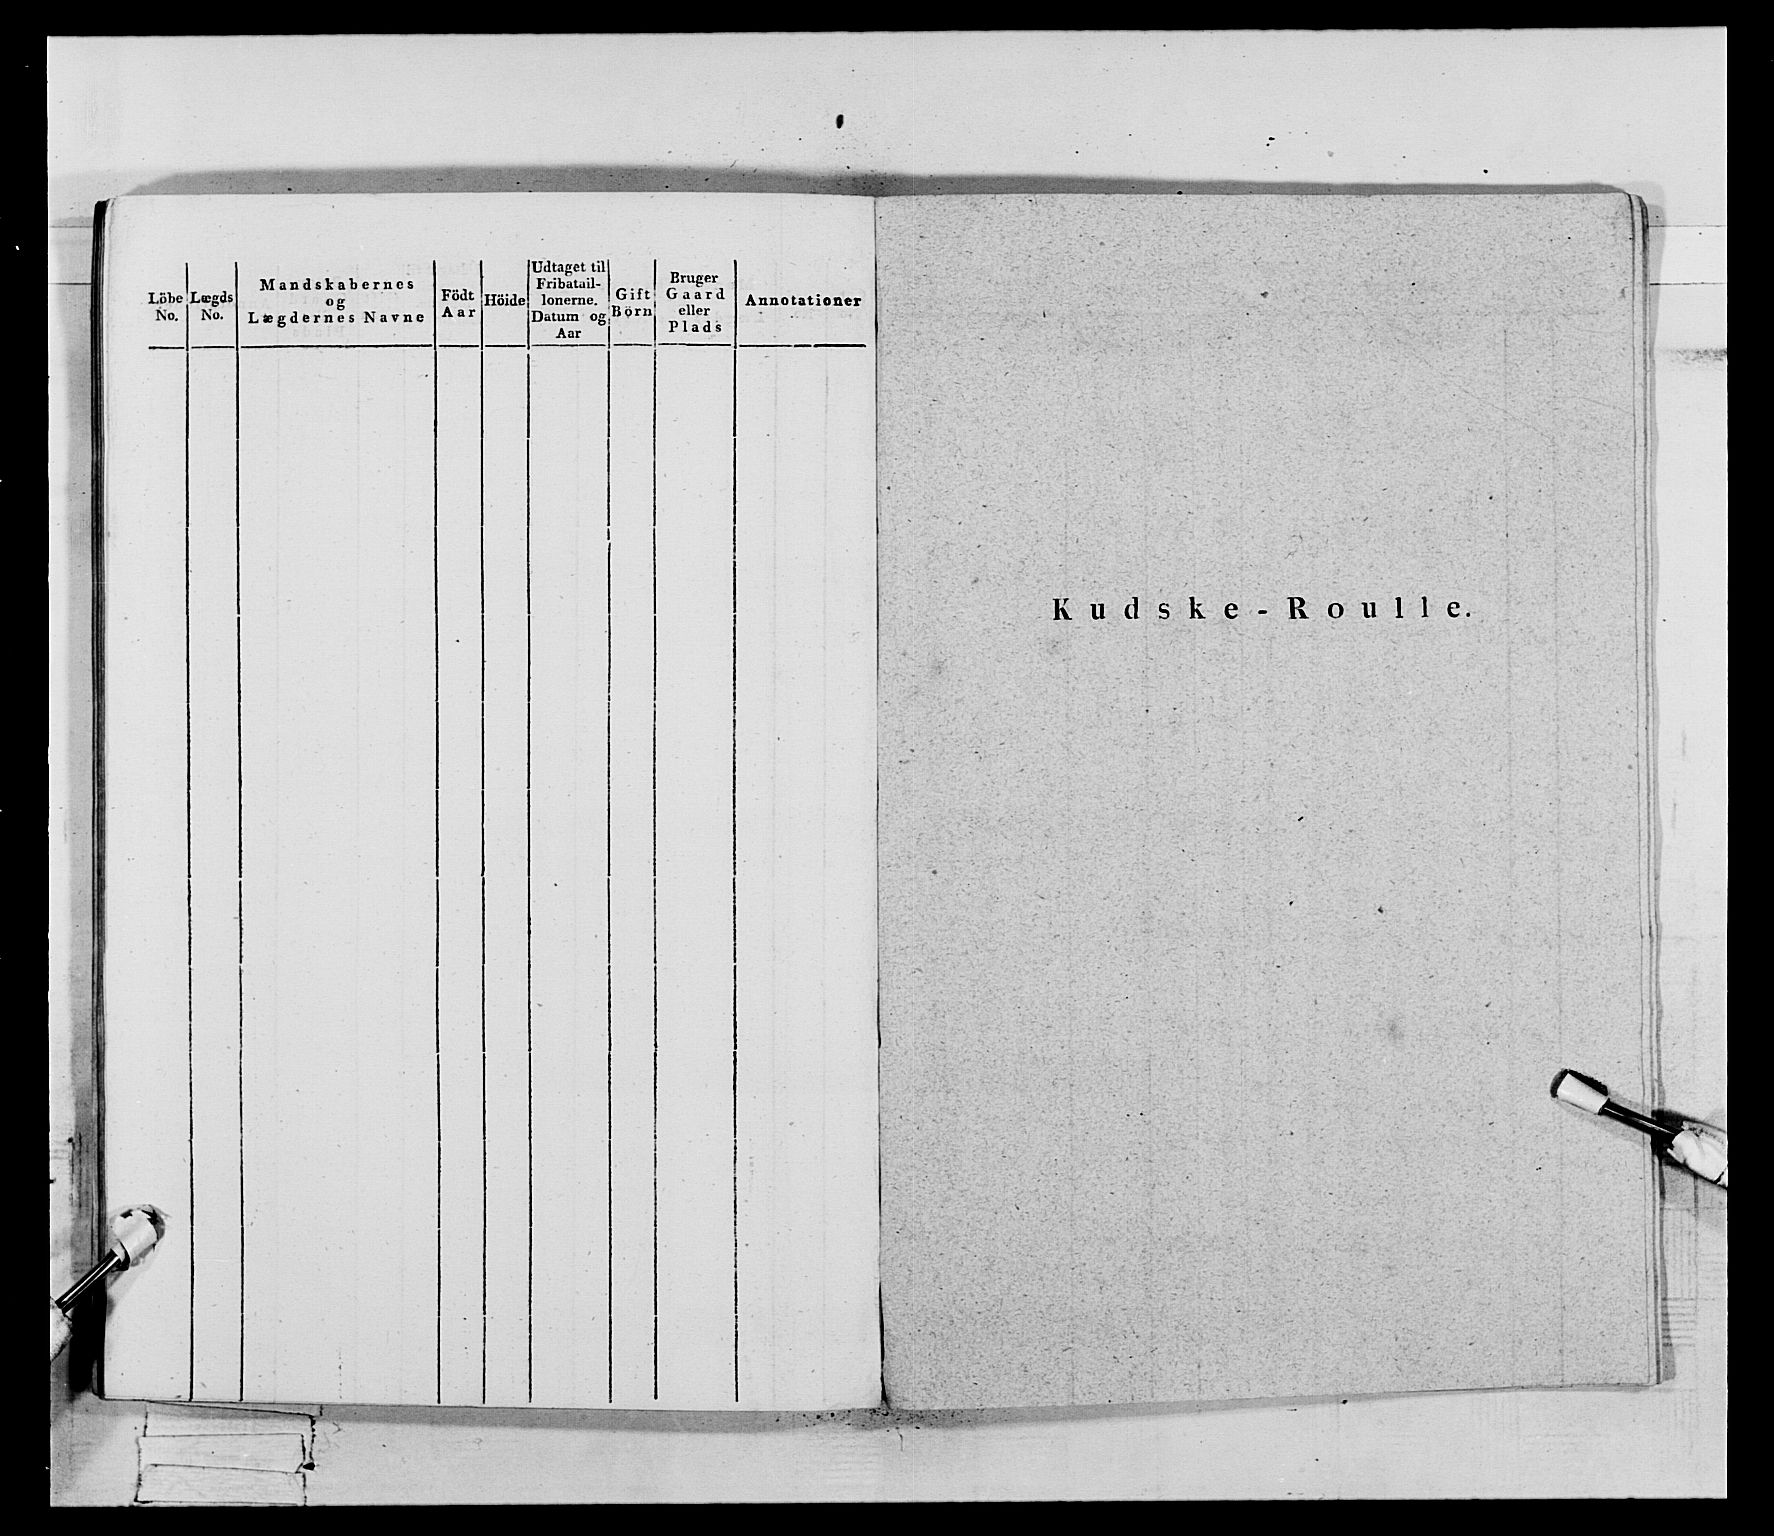 RA, Generalitets- og kommissariatskollegiet, Det kongelige norske kommissariatskollegium, E/Eh/L0069: Opplandske gevorbne infanteriregiment, 1810-1818, s. 560